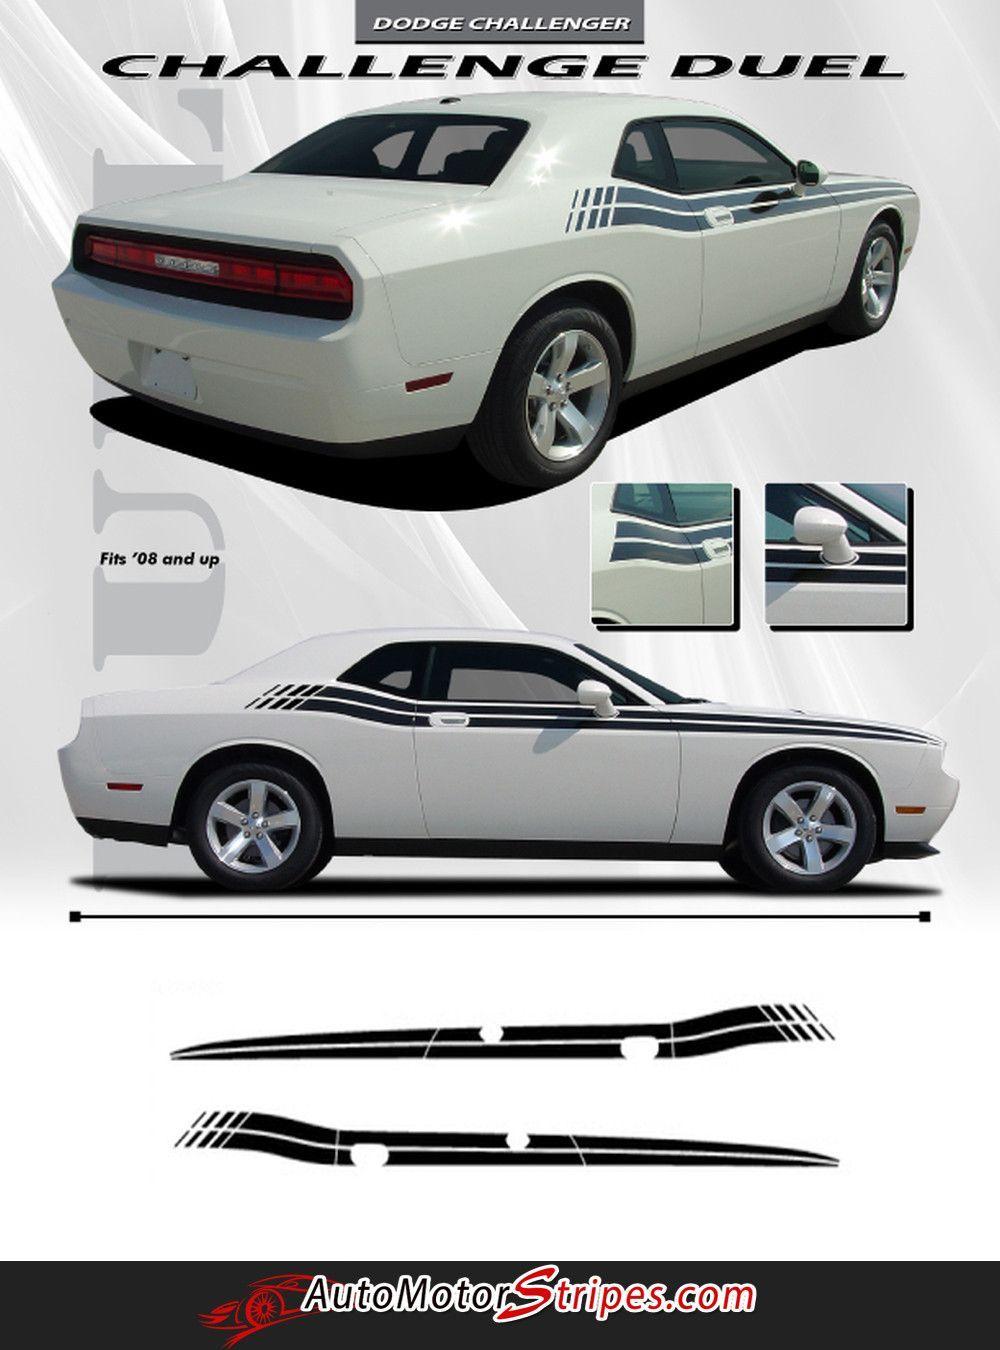 2018 2019 Dodge Challenger Dual Strobe Side Body 3M Vinyl Stripe Graphic Decal